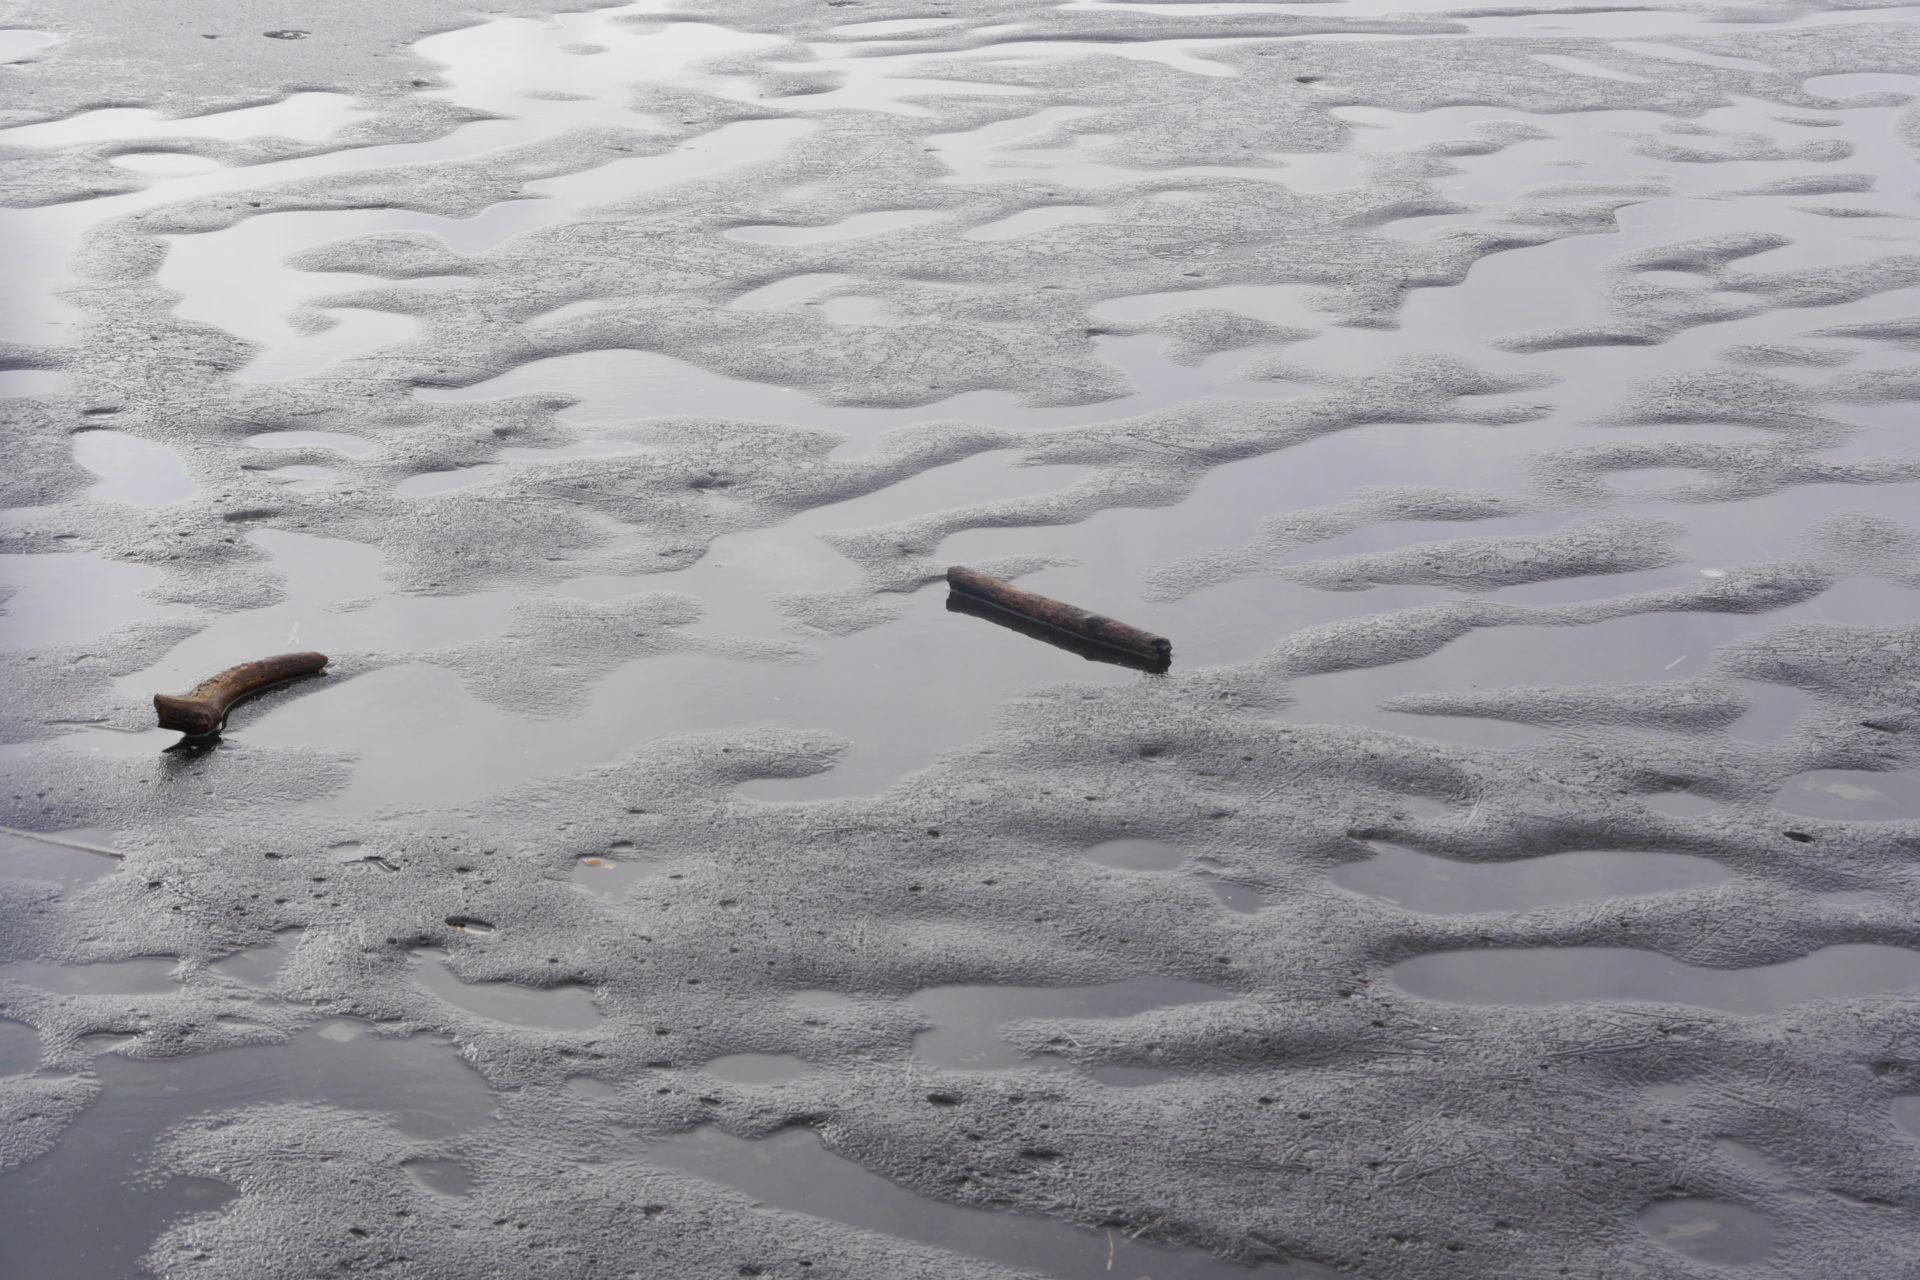 Les lacs de la Terre du Milieu |01|